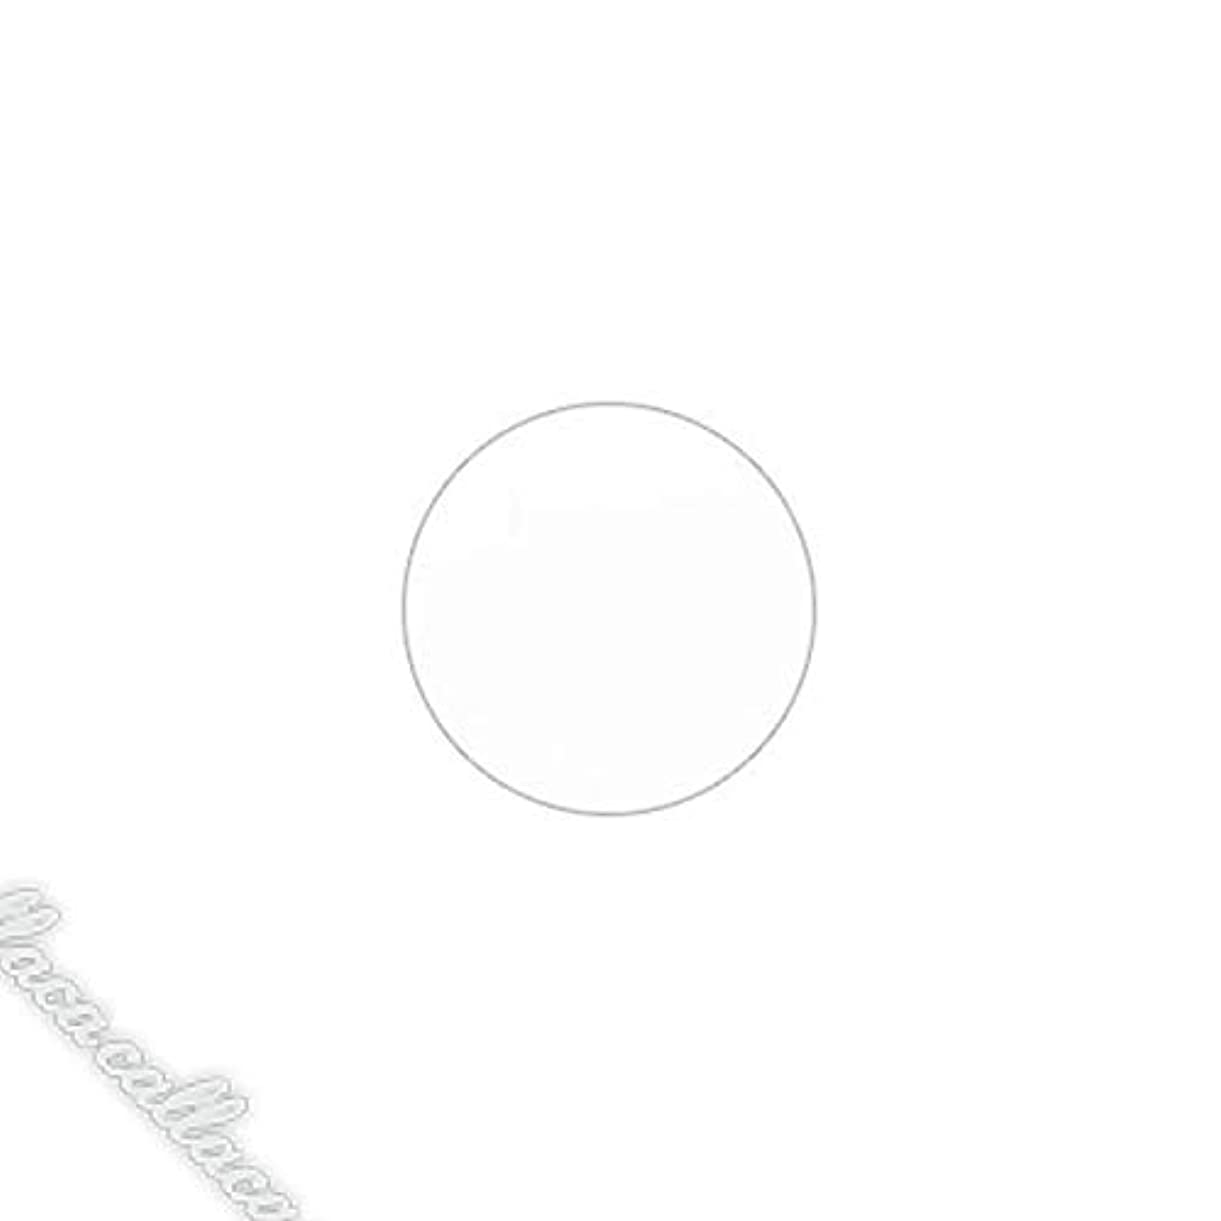 Putiel カラージェル Liner01 ホワイト